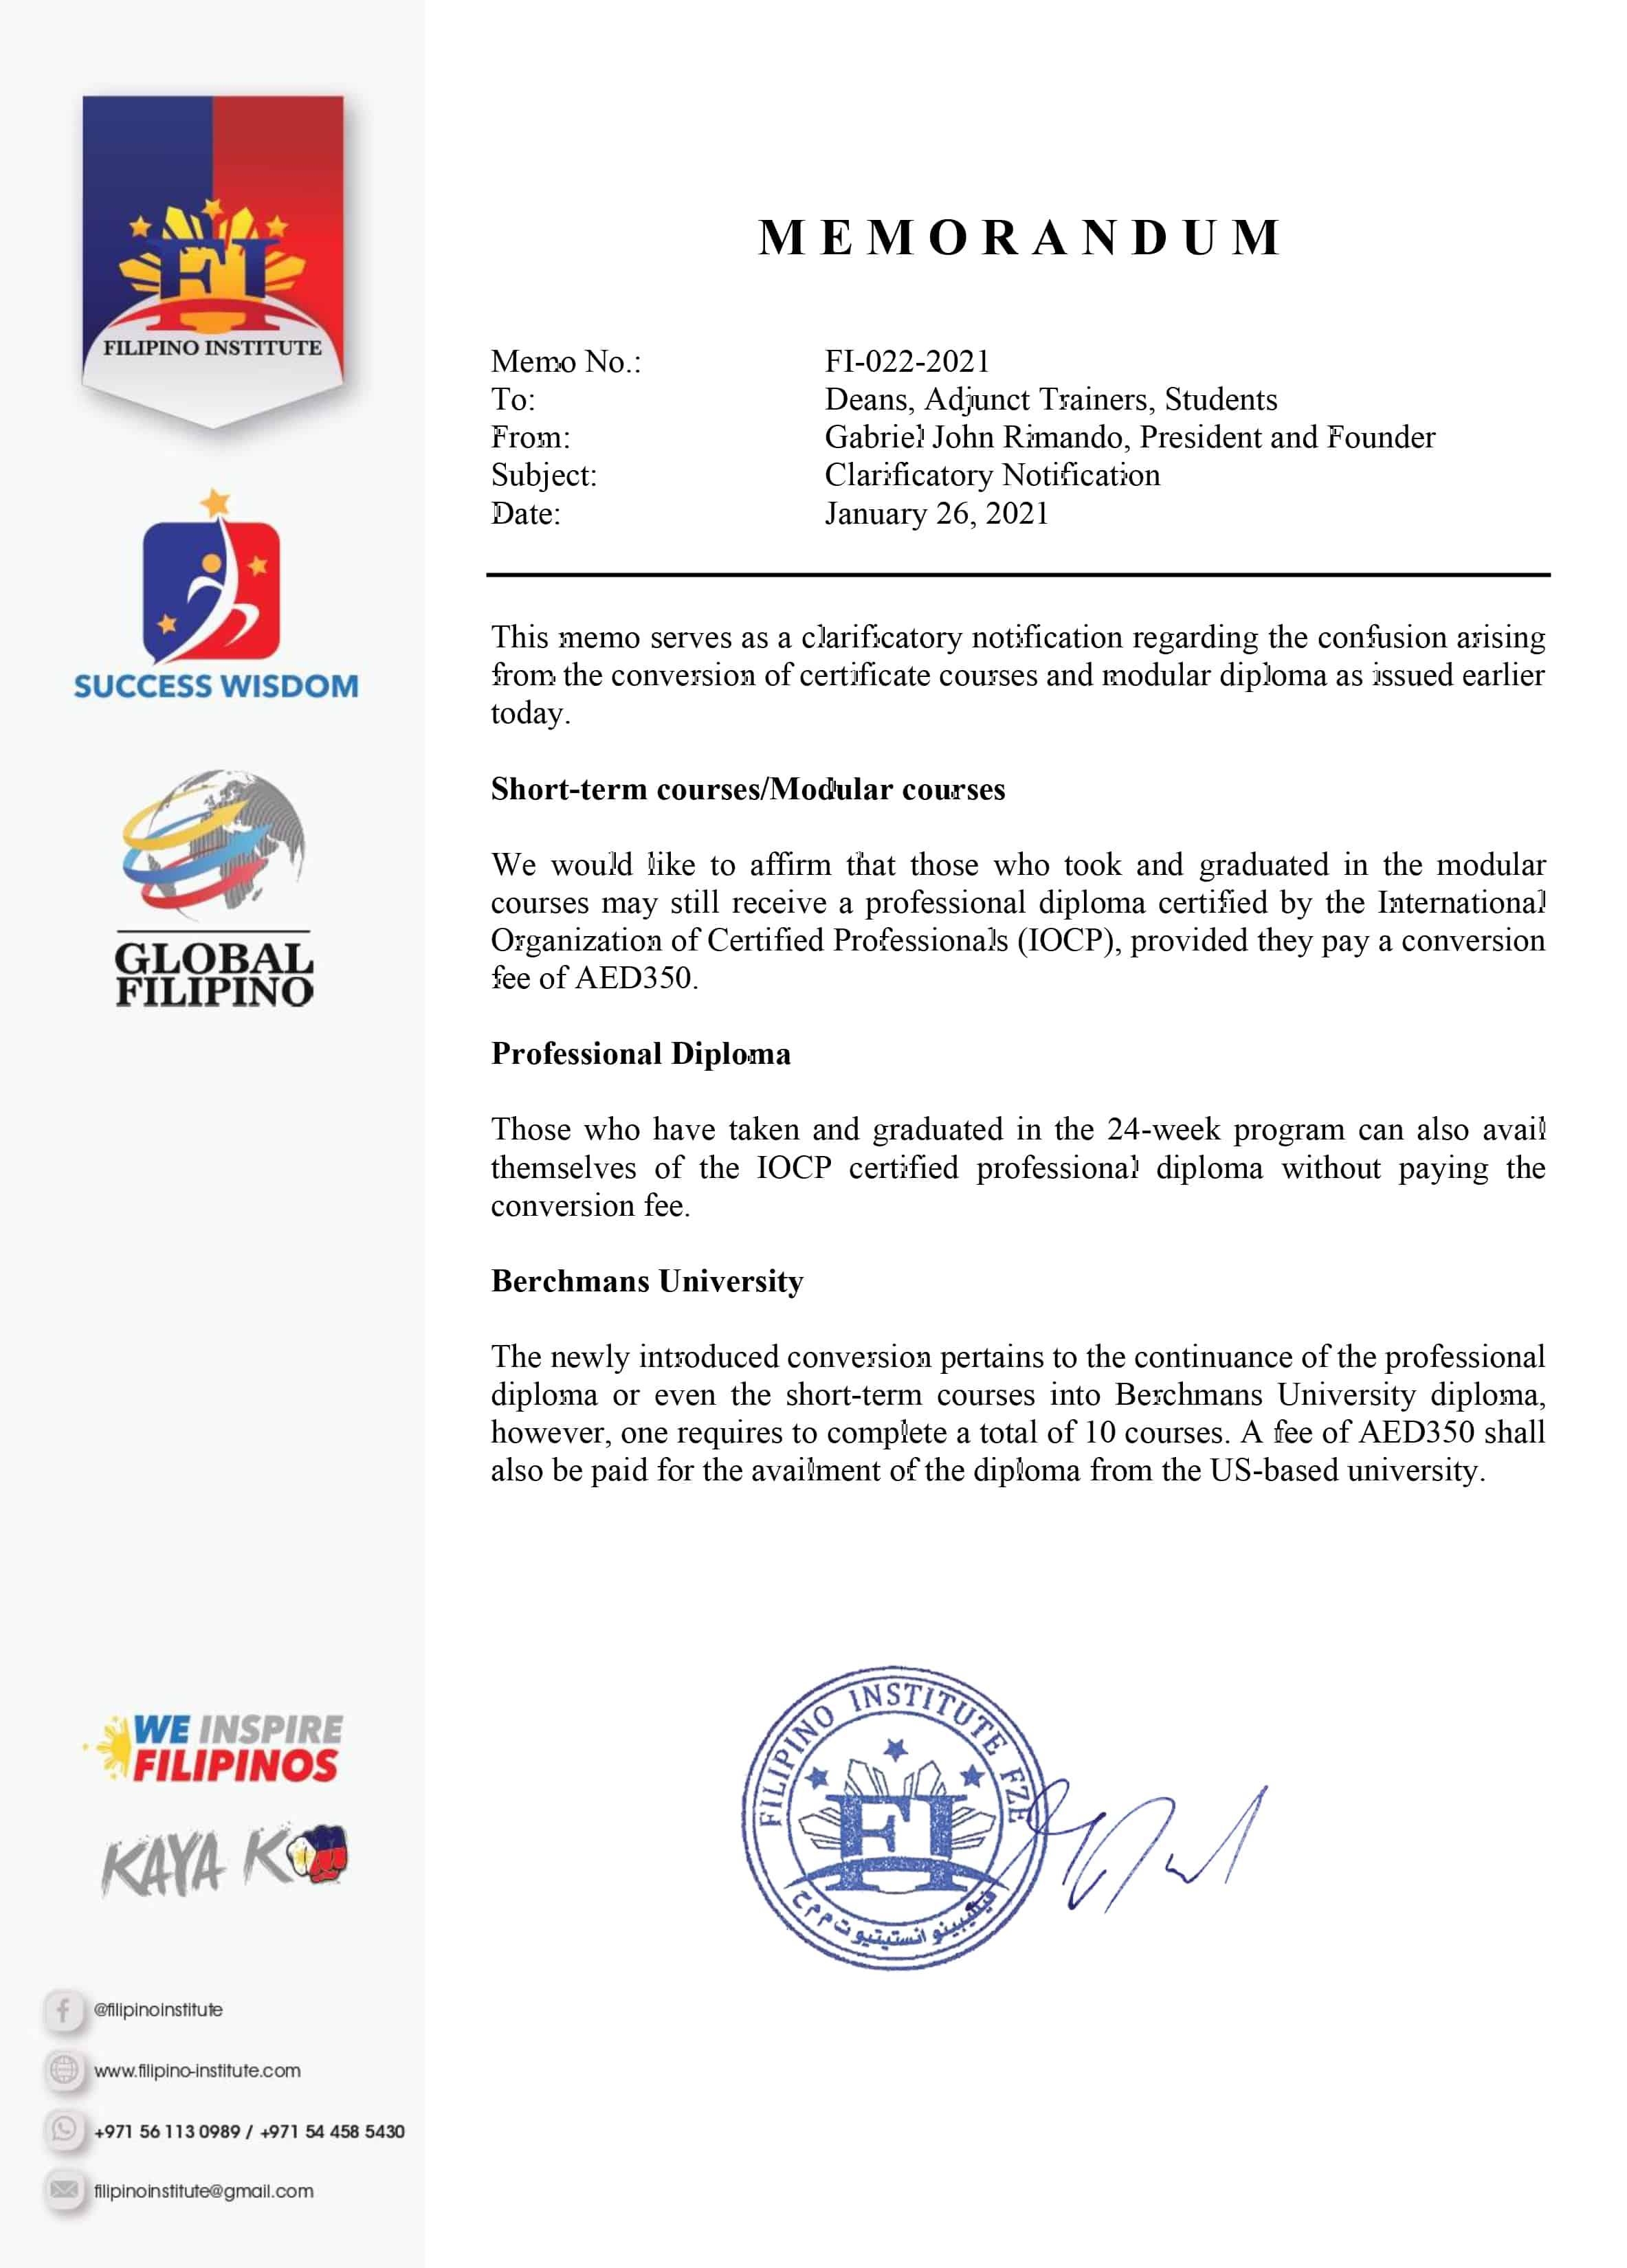 Subject : Clarificatory NotificationDate : January 26, 2021 Memo No. : FI-022-2021